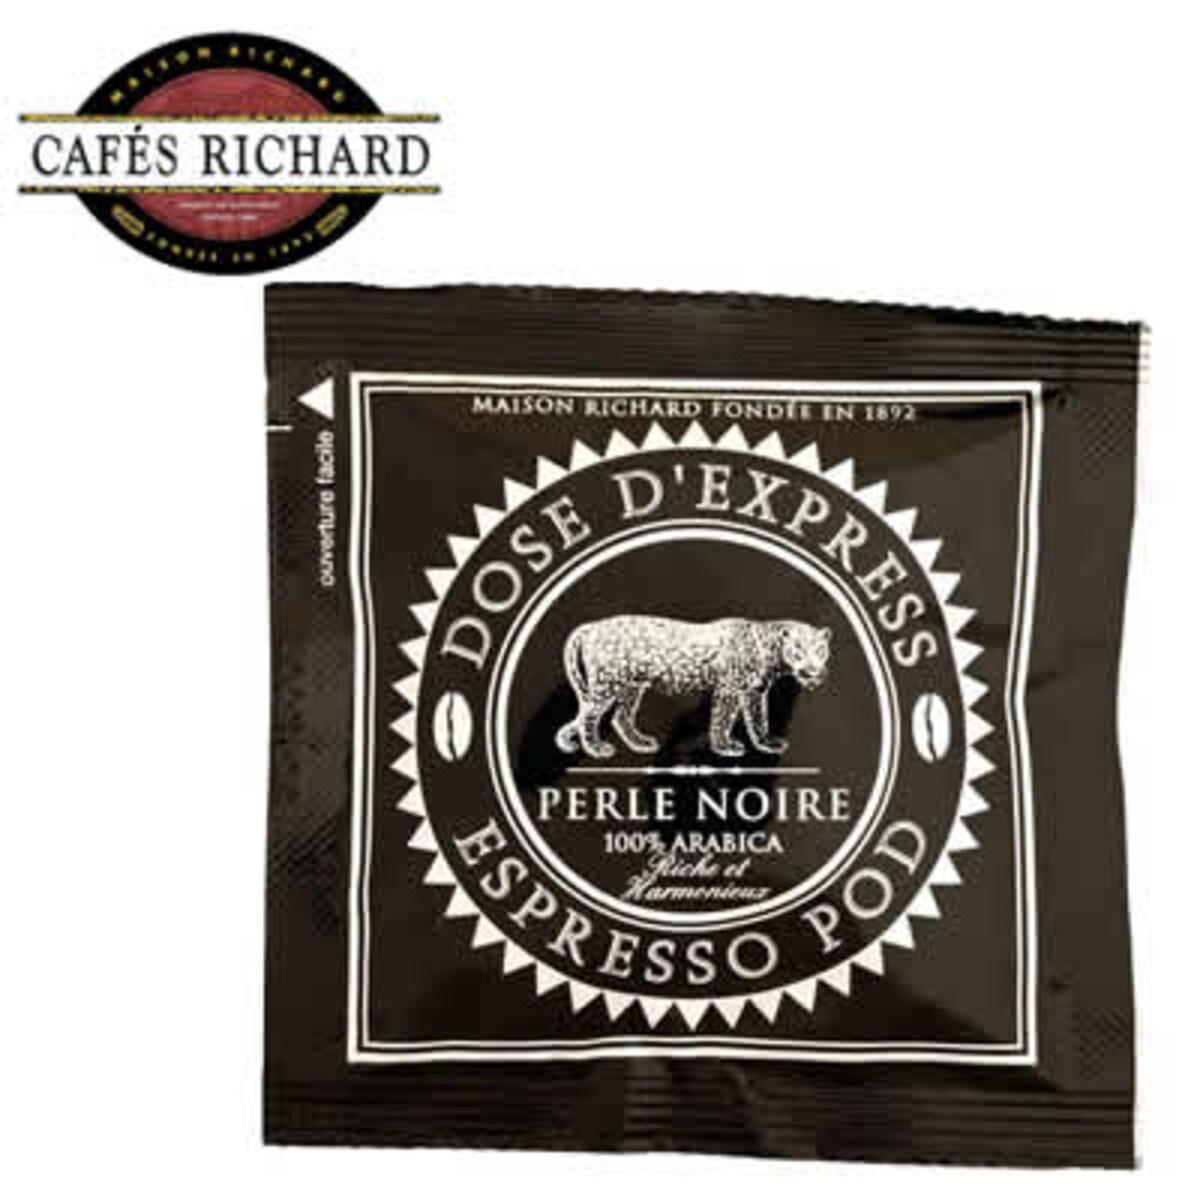 Cafés Richard Perle Noire 100бр моно дози в кашон